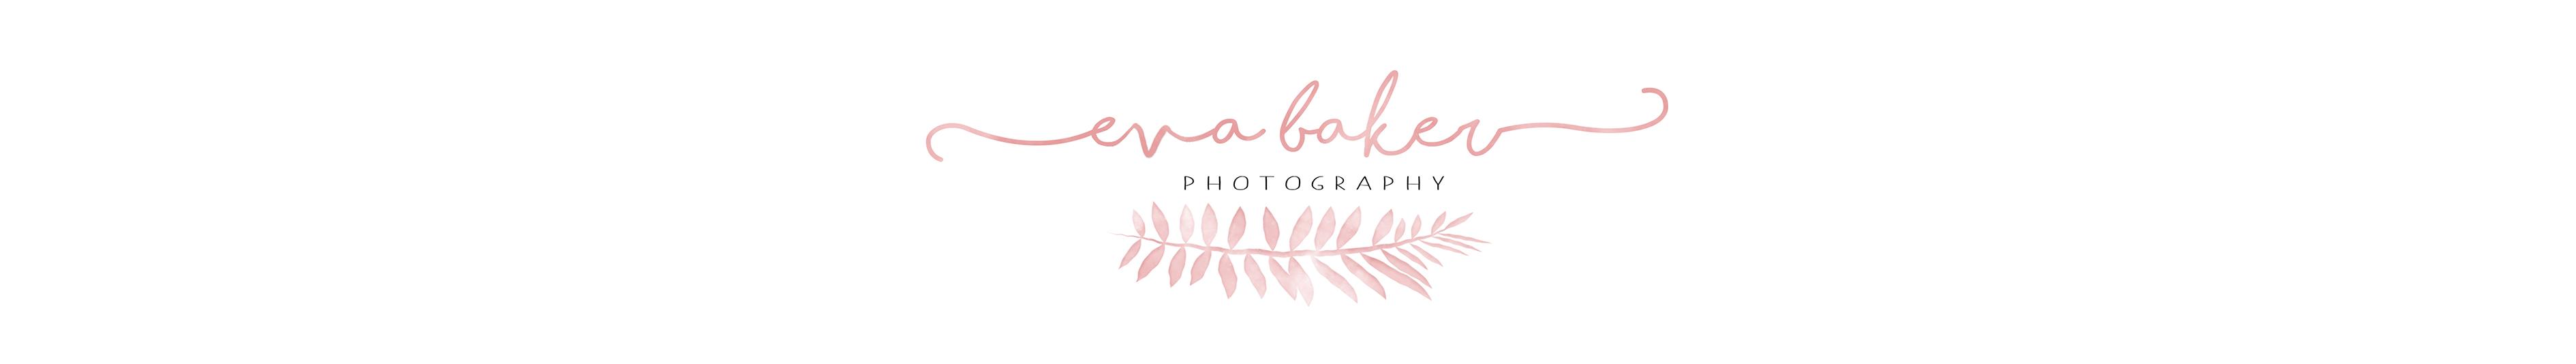 Eva Baker Photography